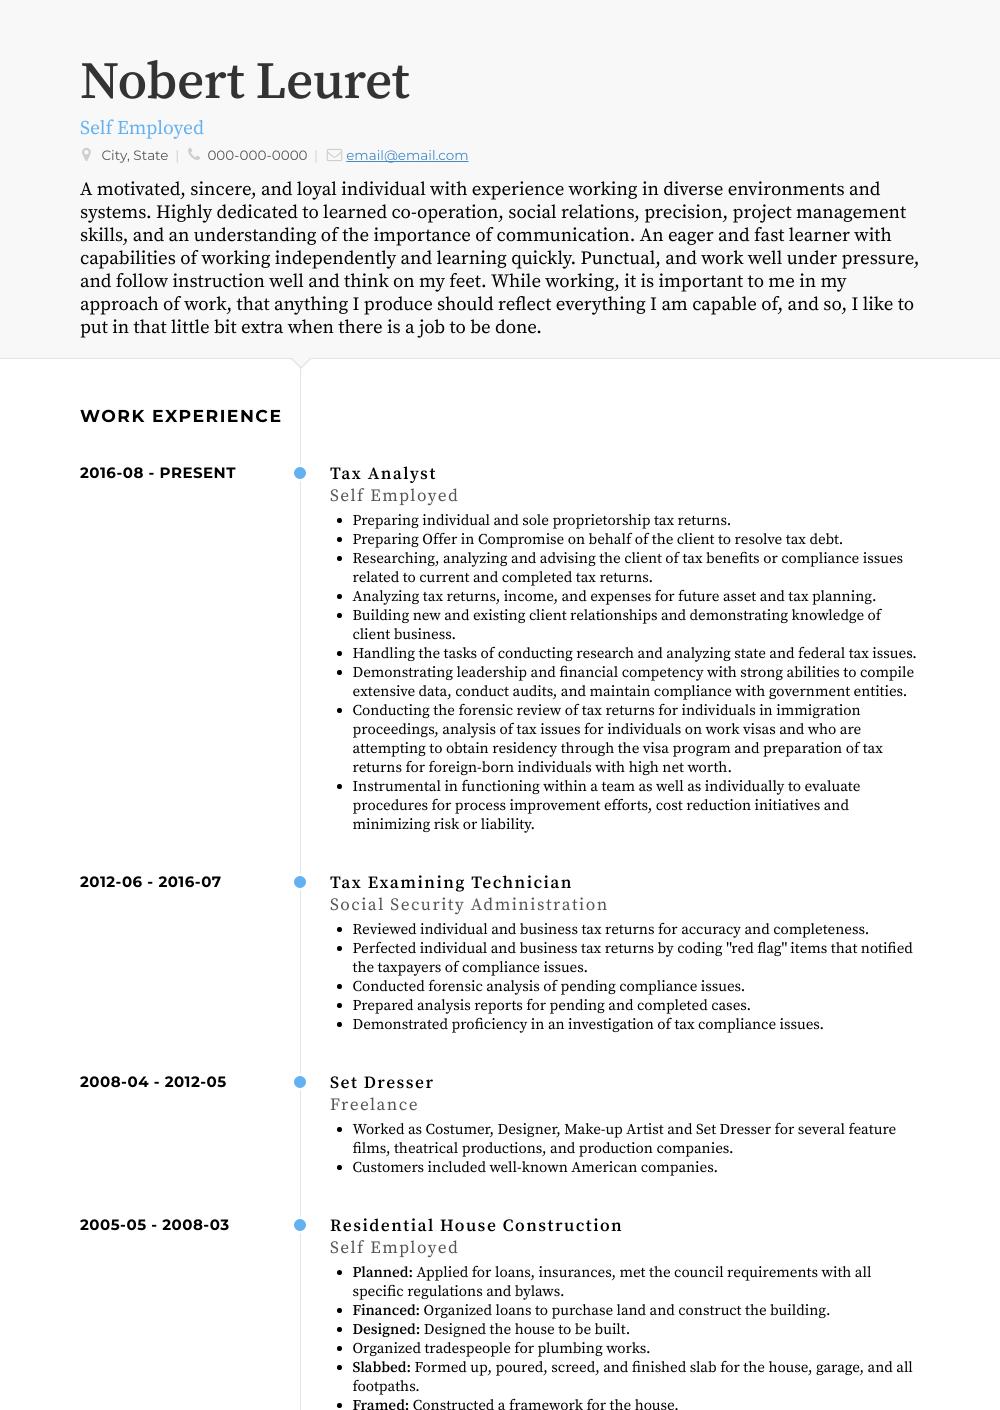 Self Employed Resume Samples & Templates VisualCV